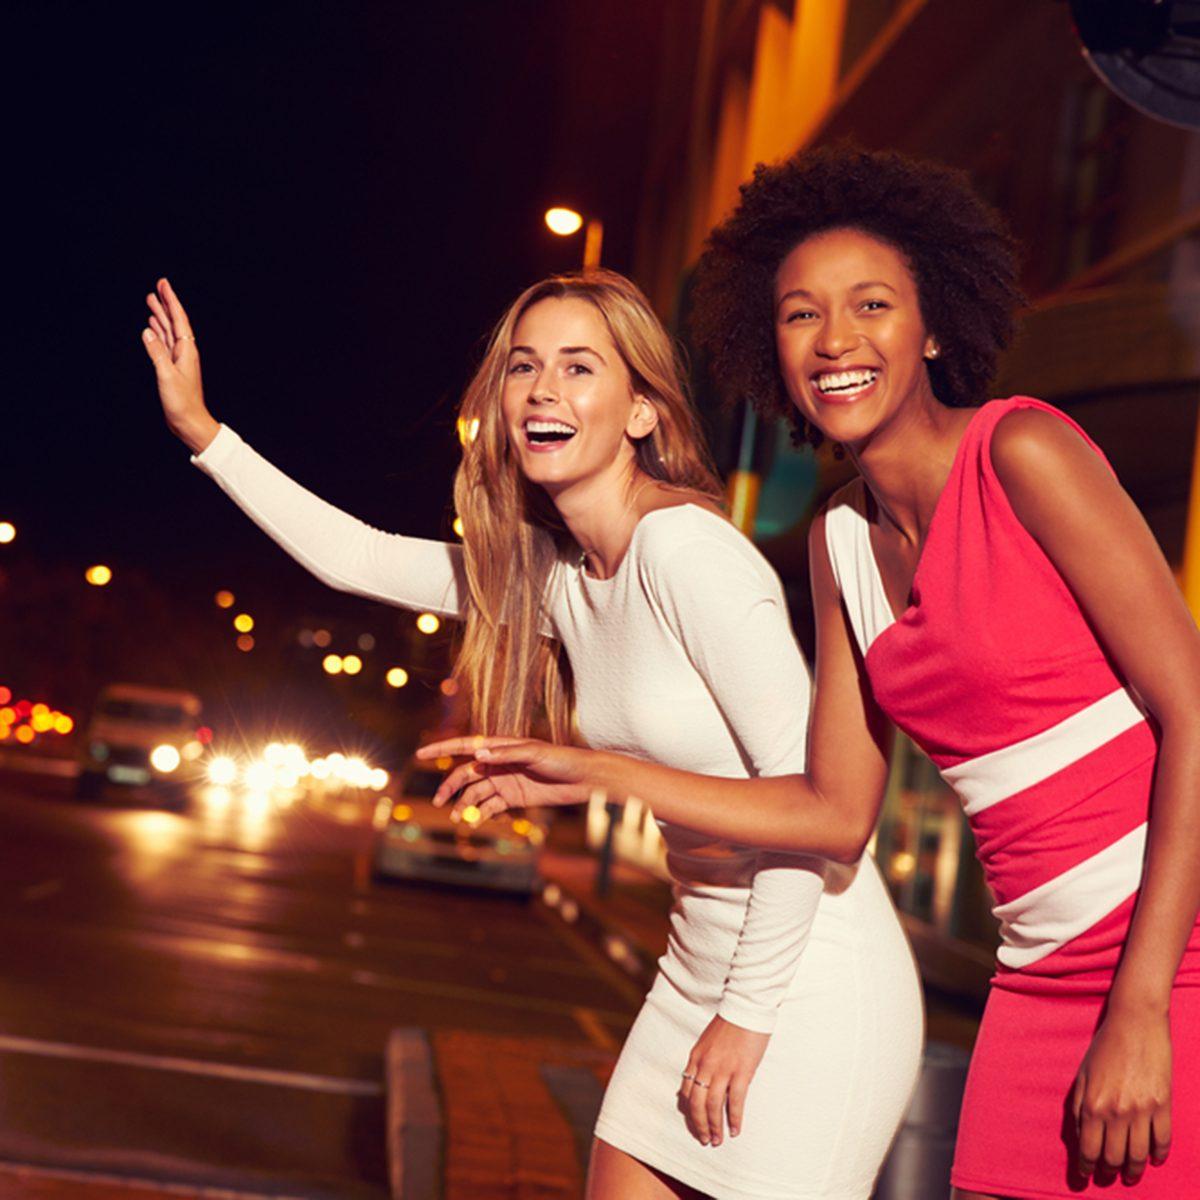 Female friends hailing taxi on city street at night; Shutterstock ID 289805144; Job (TFH, TOH, RD, BNB, CWM, CM): TOH